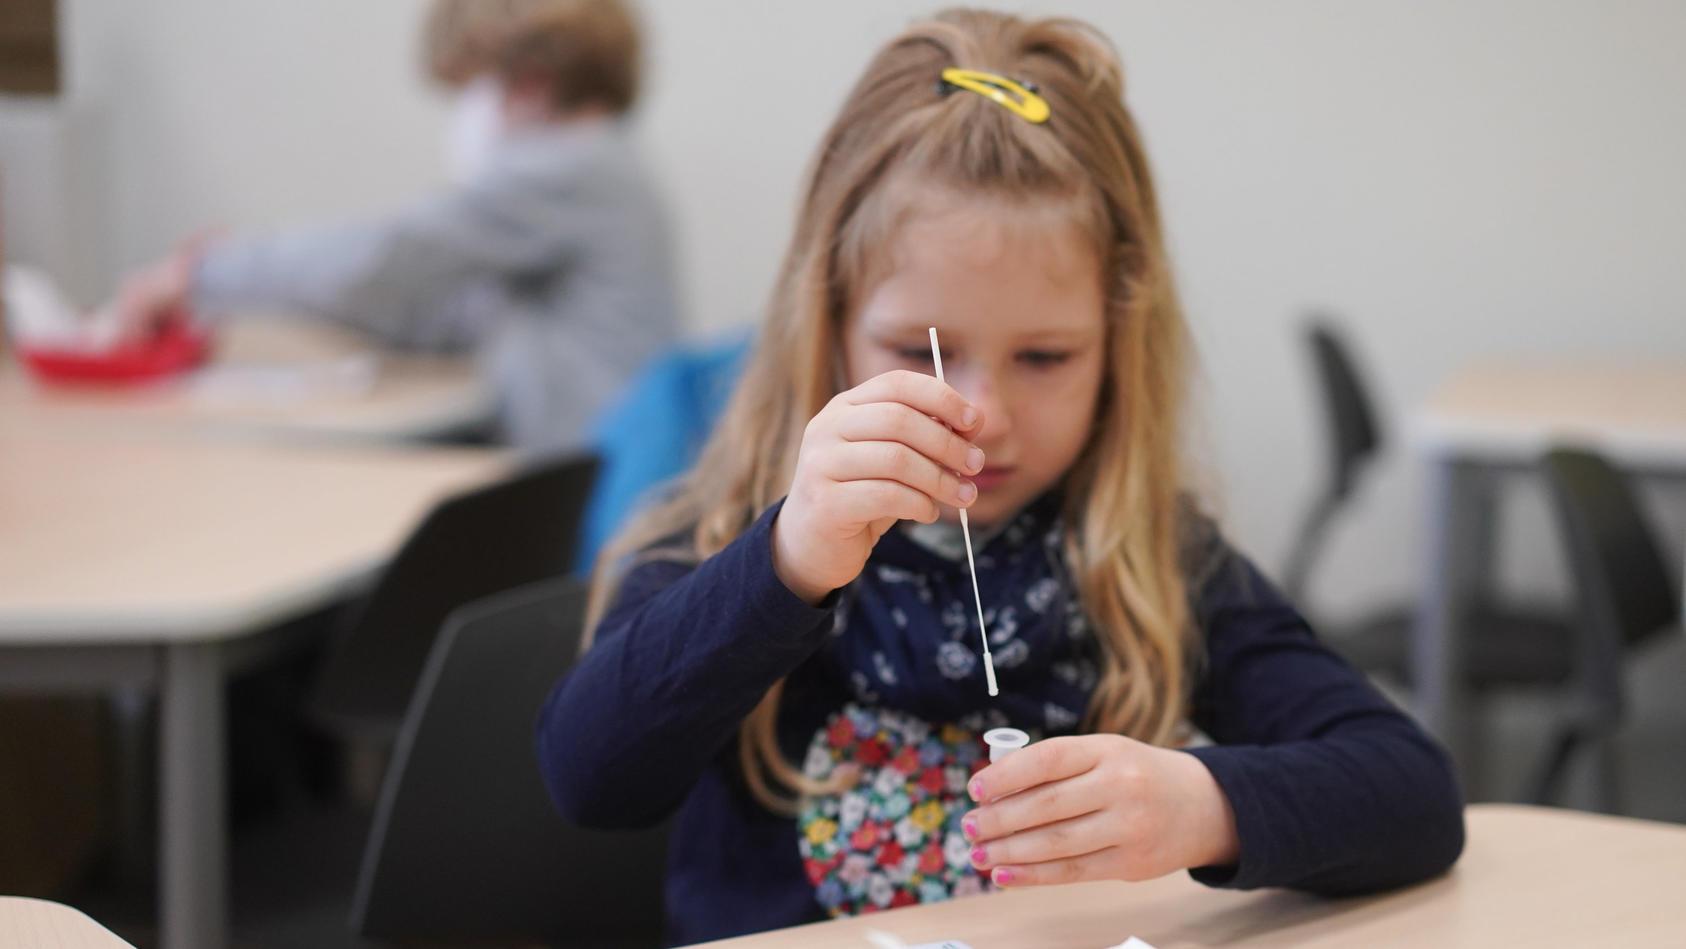 Coronavirus - Selbsttest an Berliner Schule